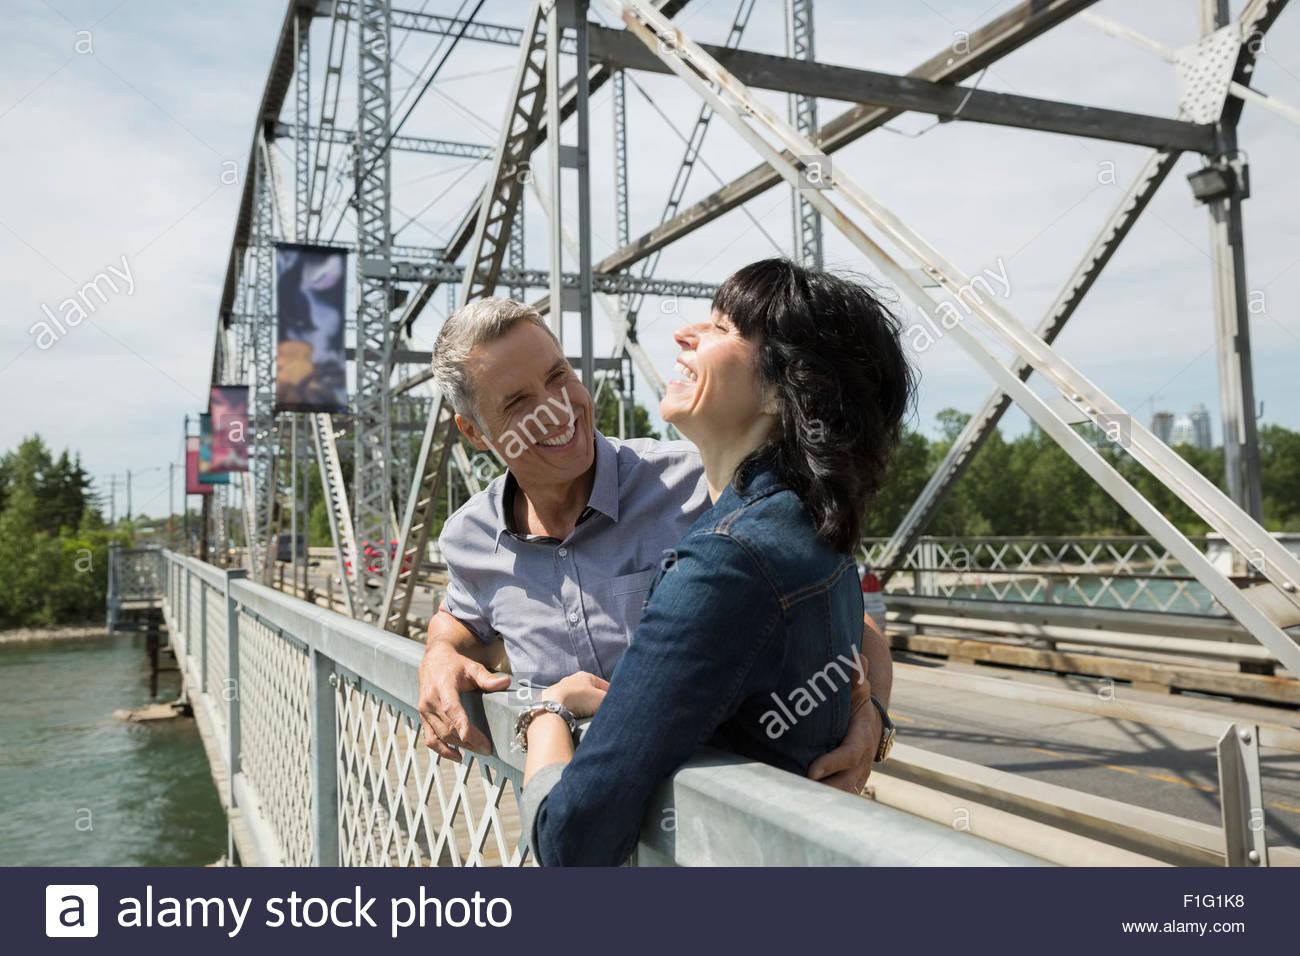 Paar Lachen auf Brücke über Fluss Stockbild